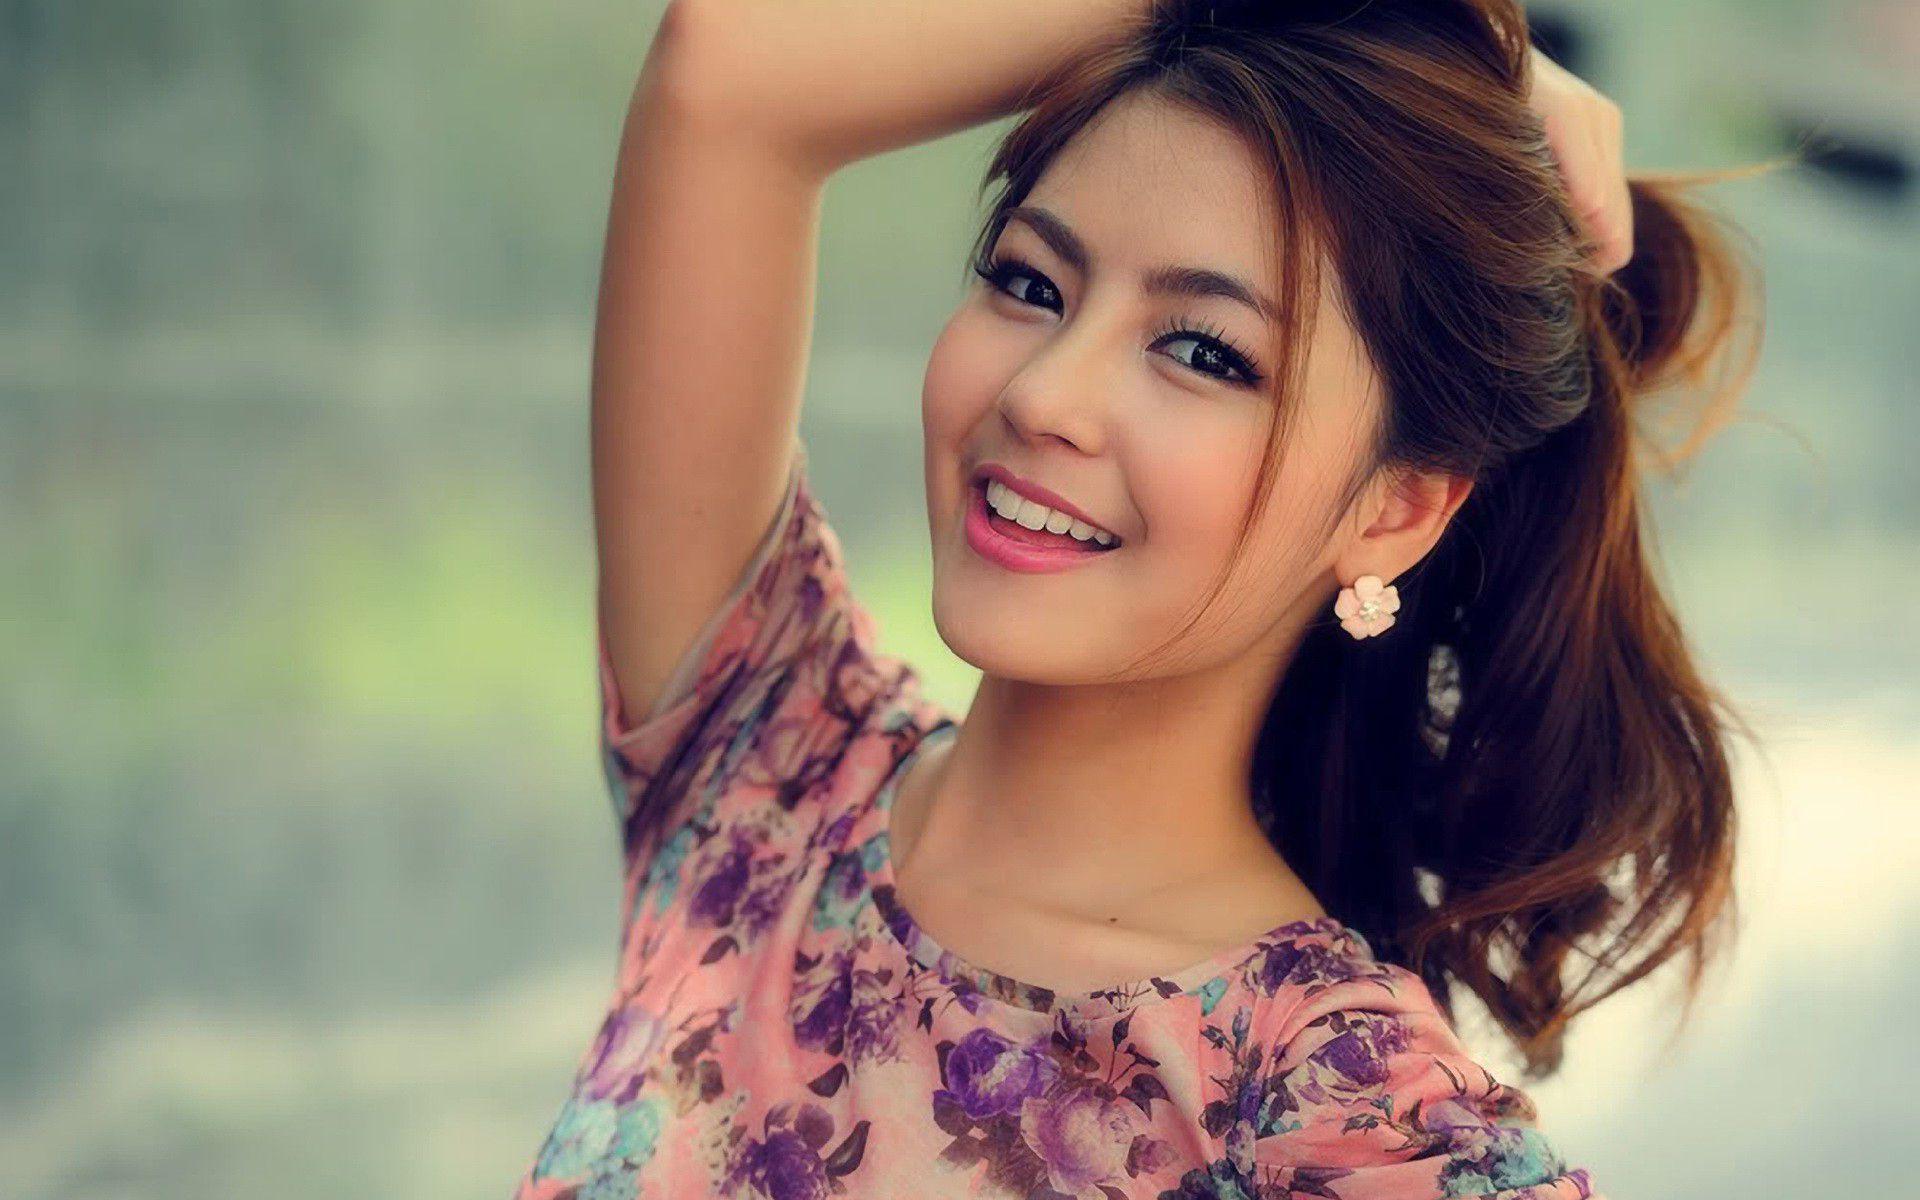 Beautiful Cute Girl Wallpapers Top Free Beautiful Cute Girl